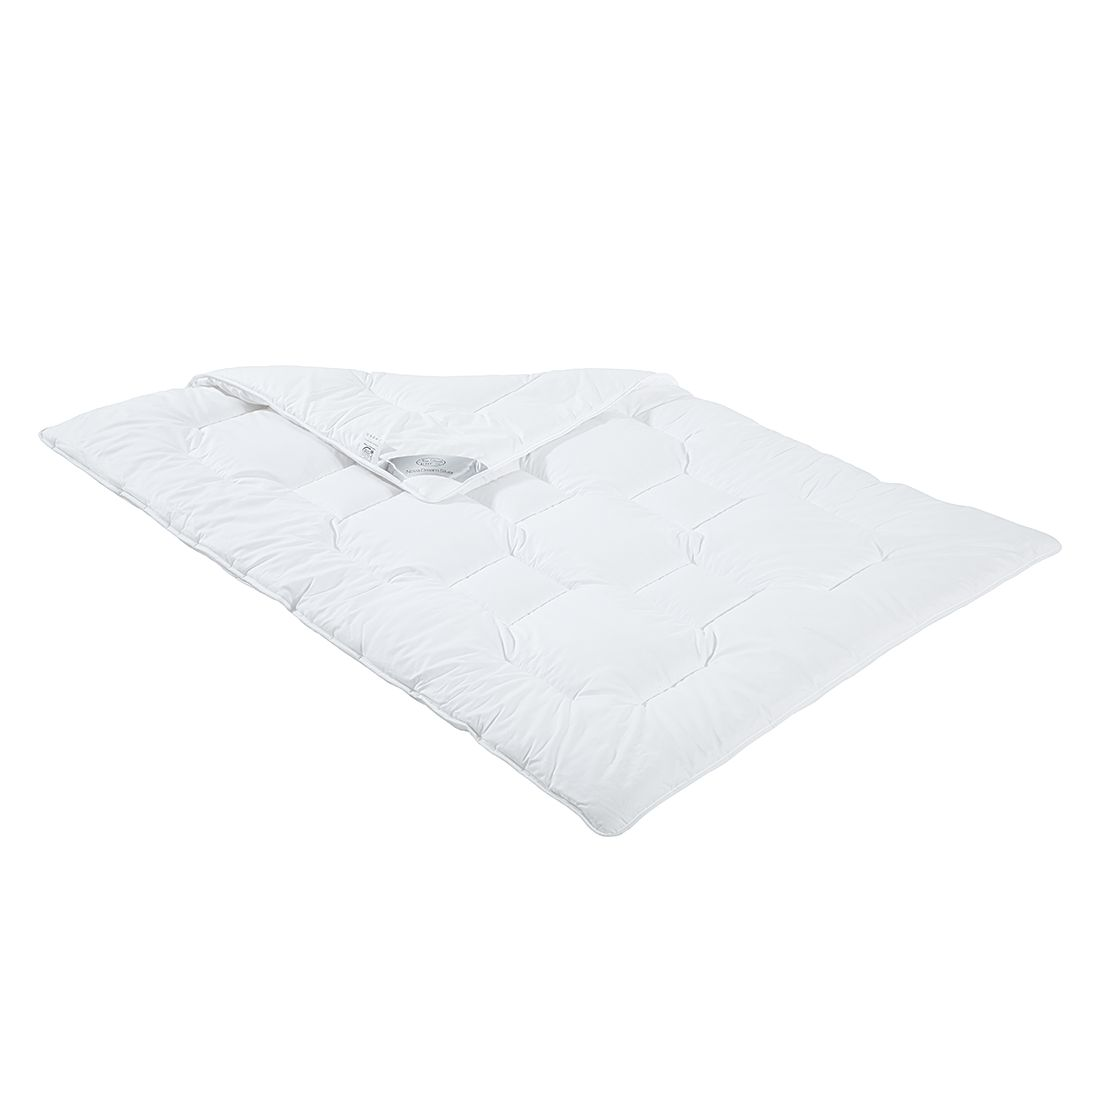 Bettdecke Nova Dream Silver – 155 x 220 cm – Medium, Nova Dream Sleepline günstig kaufen